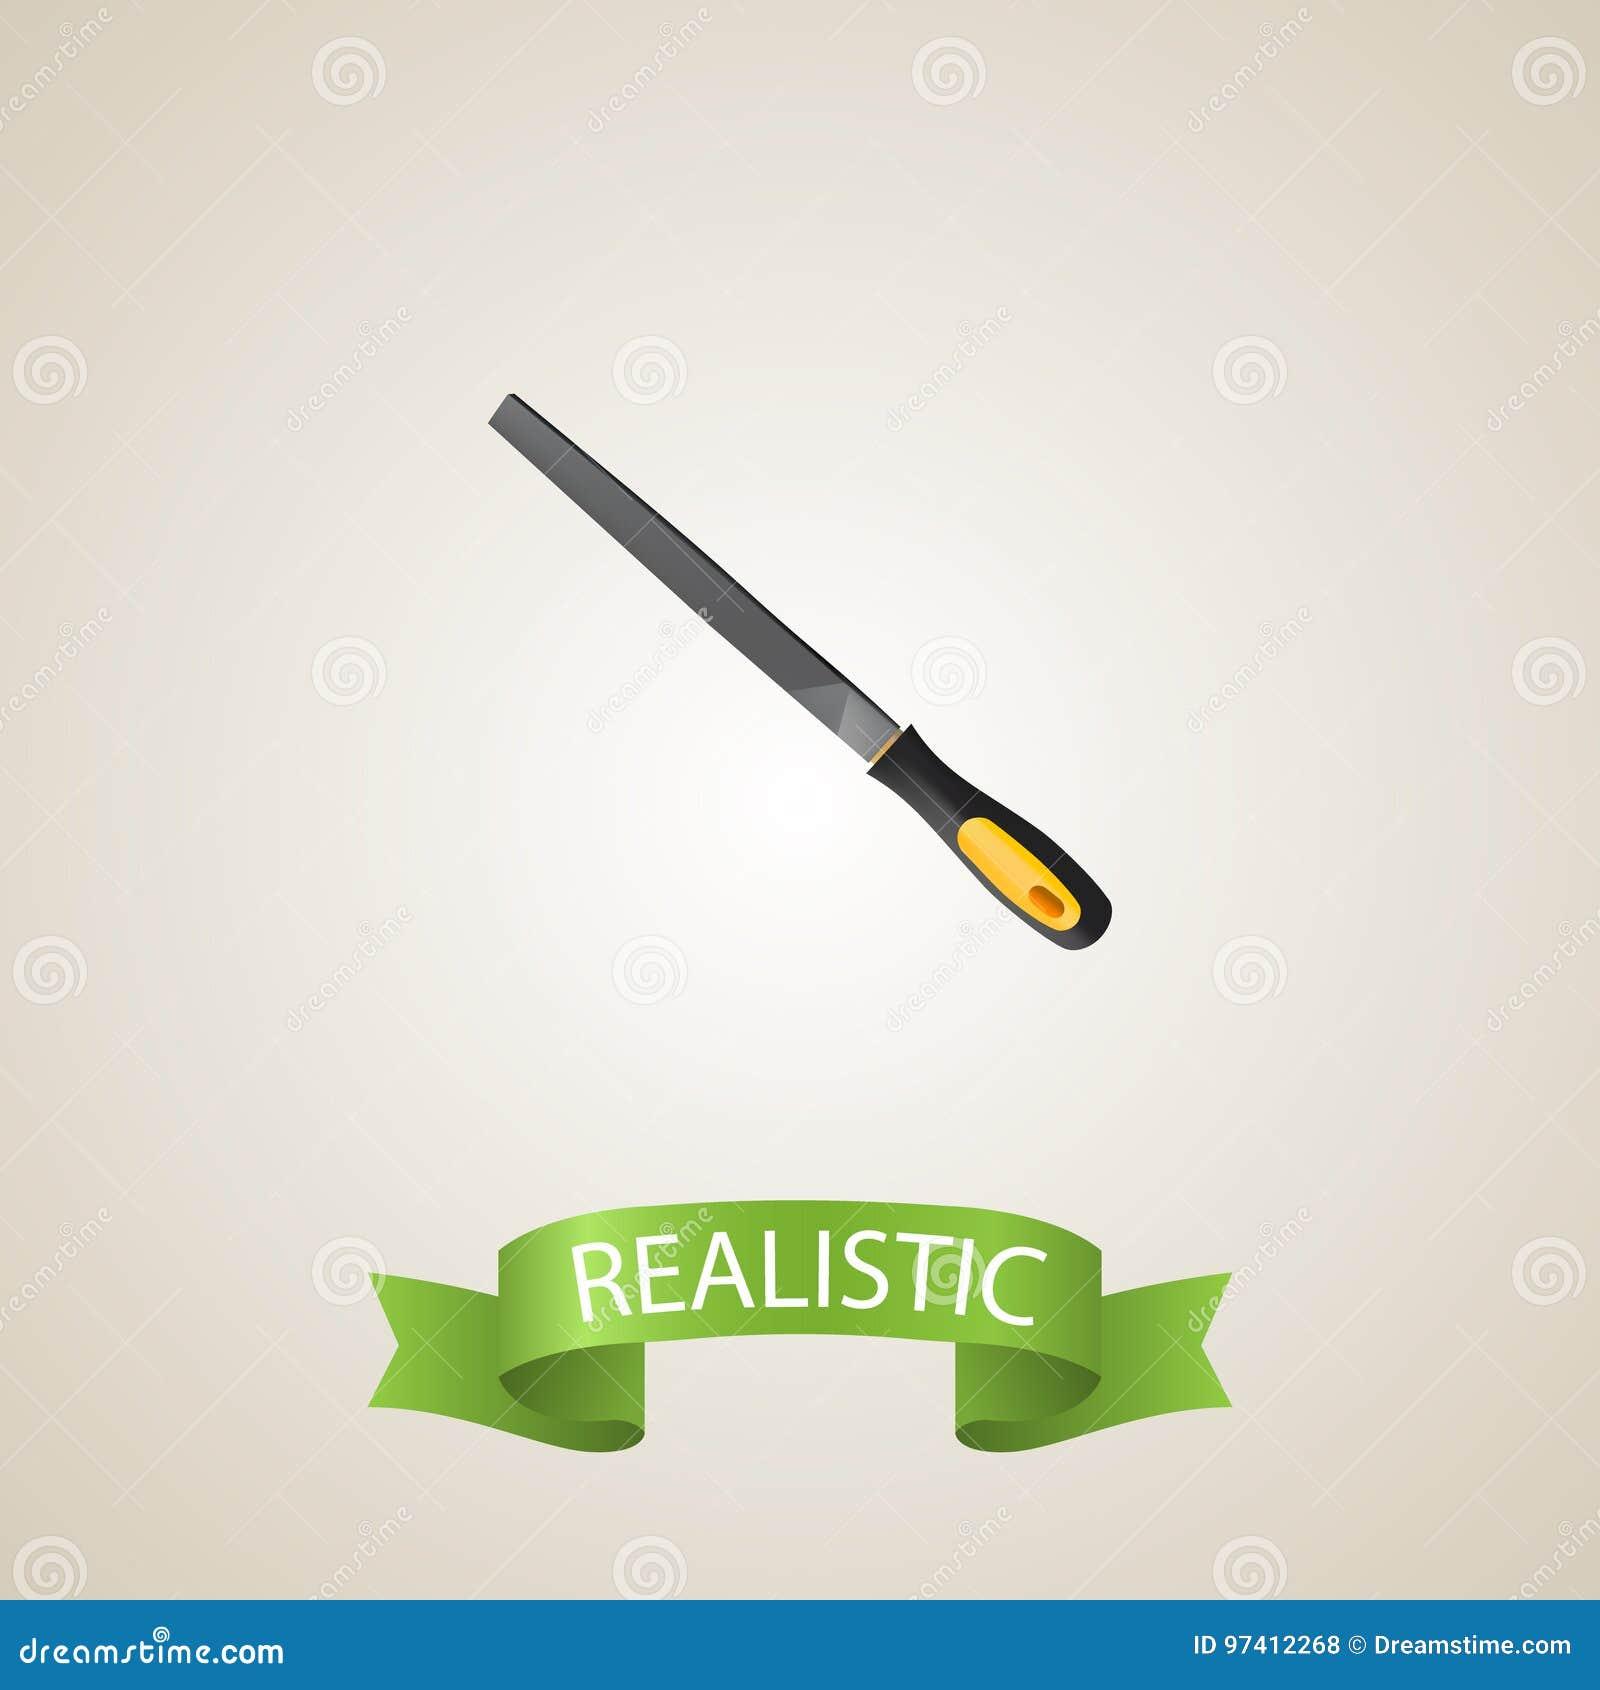 Realistic Rasp File Element  Vector Illustration Of